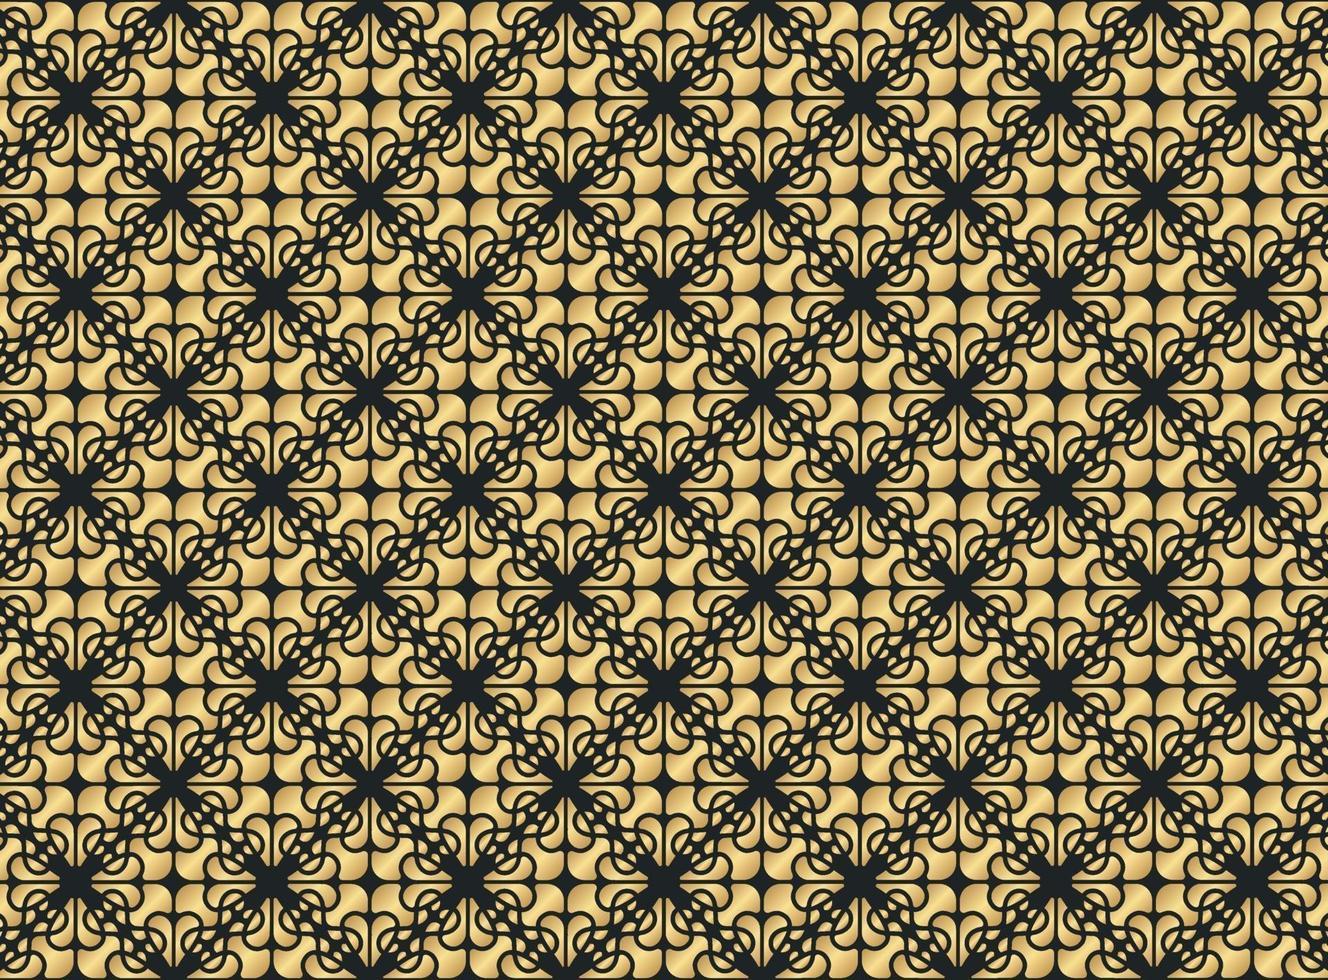 lyxig guld prydnad mönster design bakgrund vektor